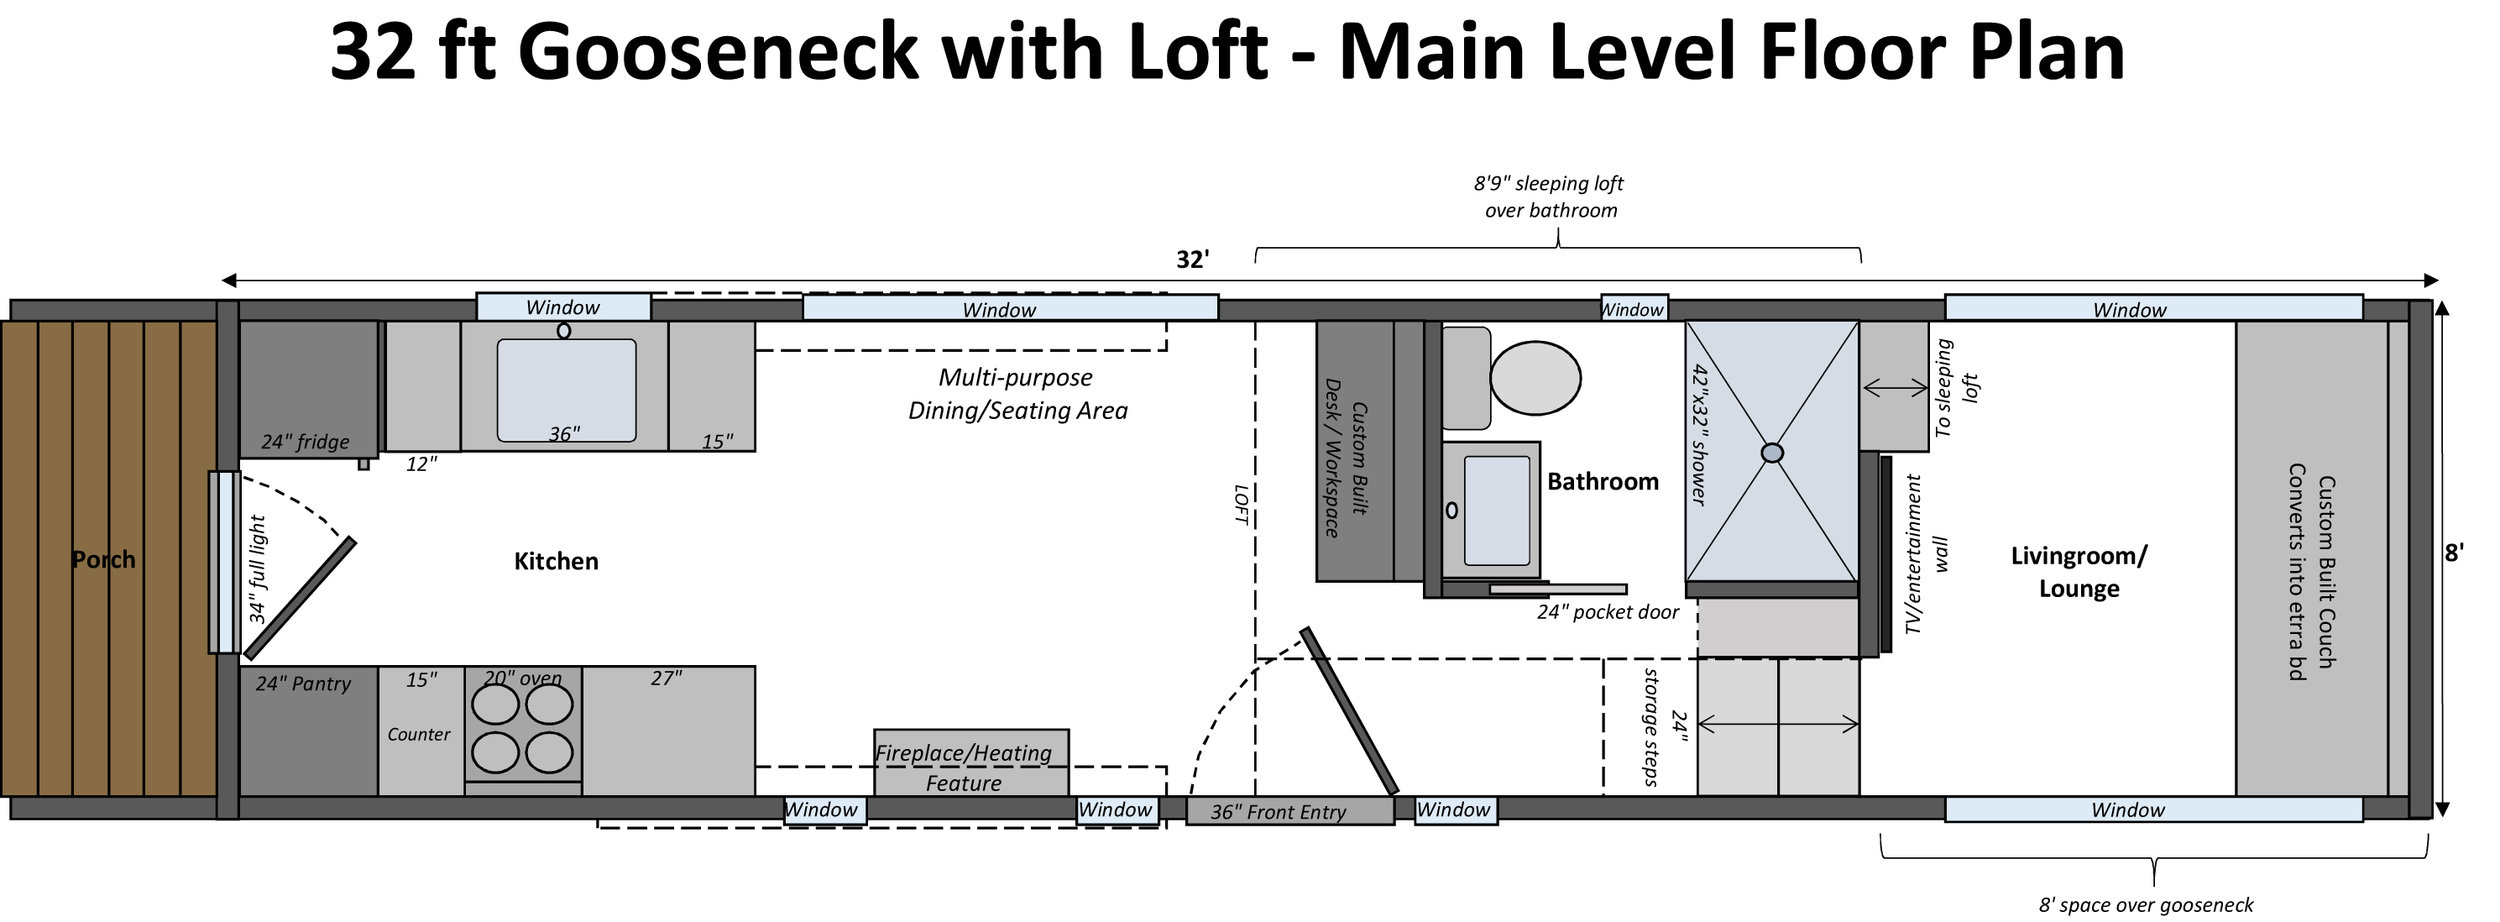 32 ft GN with Loft - Main Level.jpg